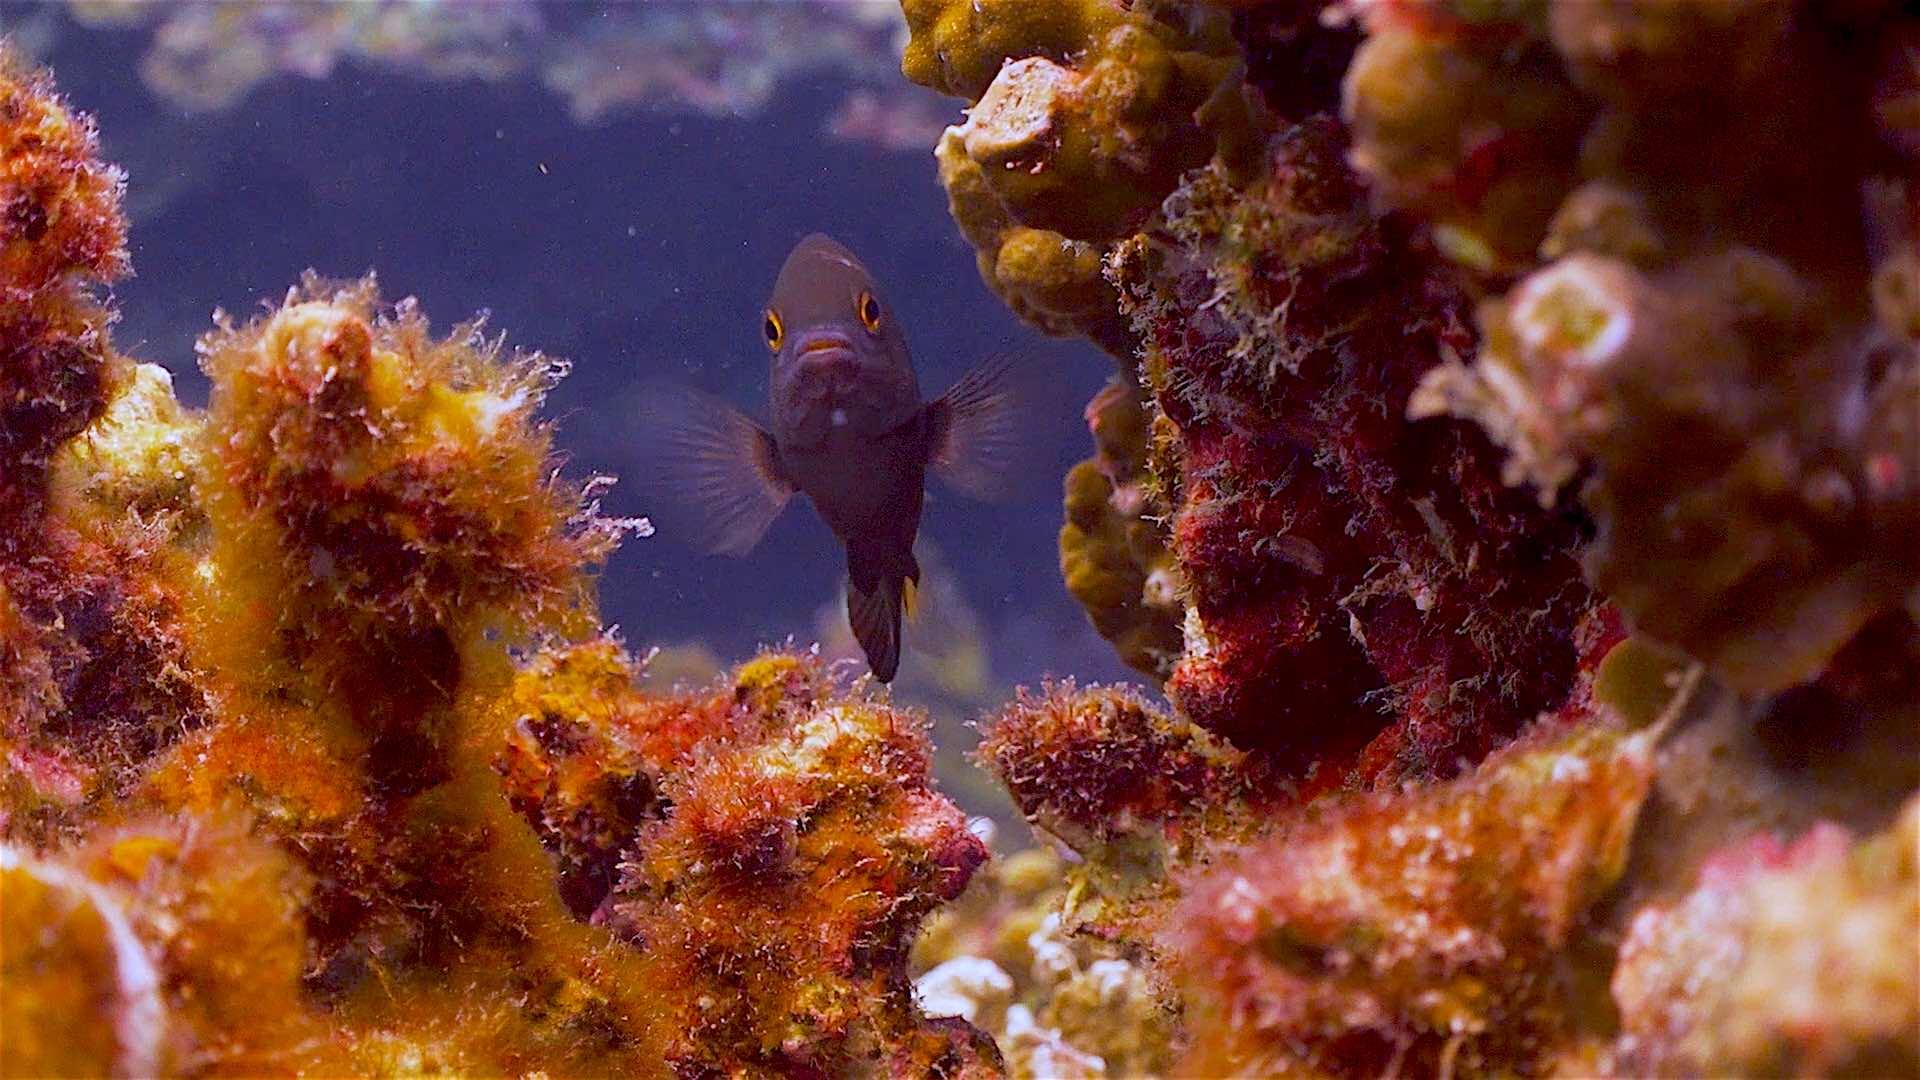 www.thefunkyturtle.com Mango Bay dive site koh tao beautiful coral reefs